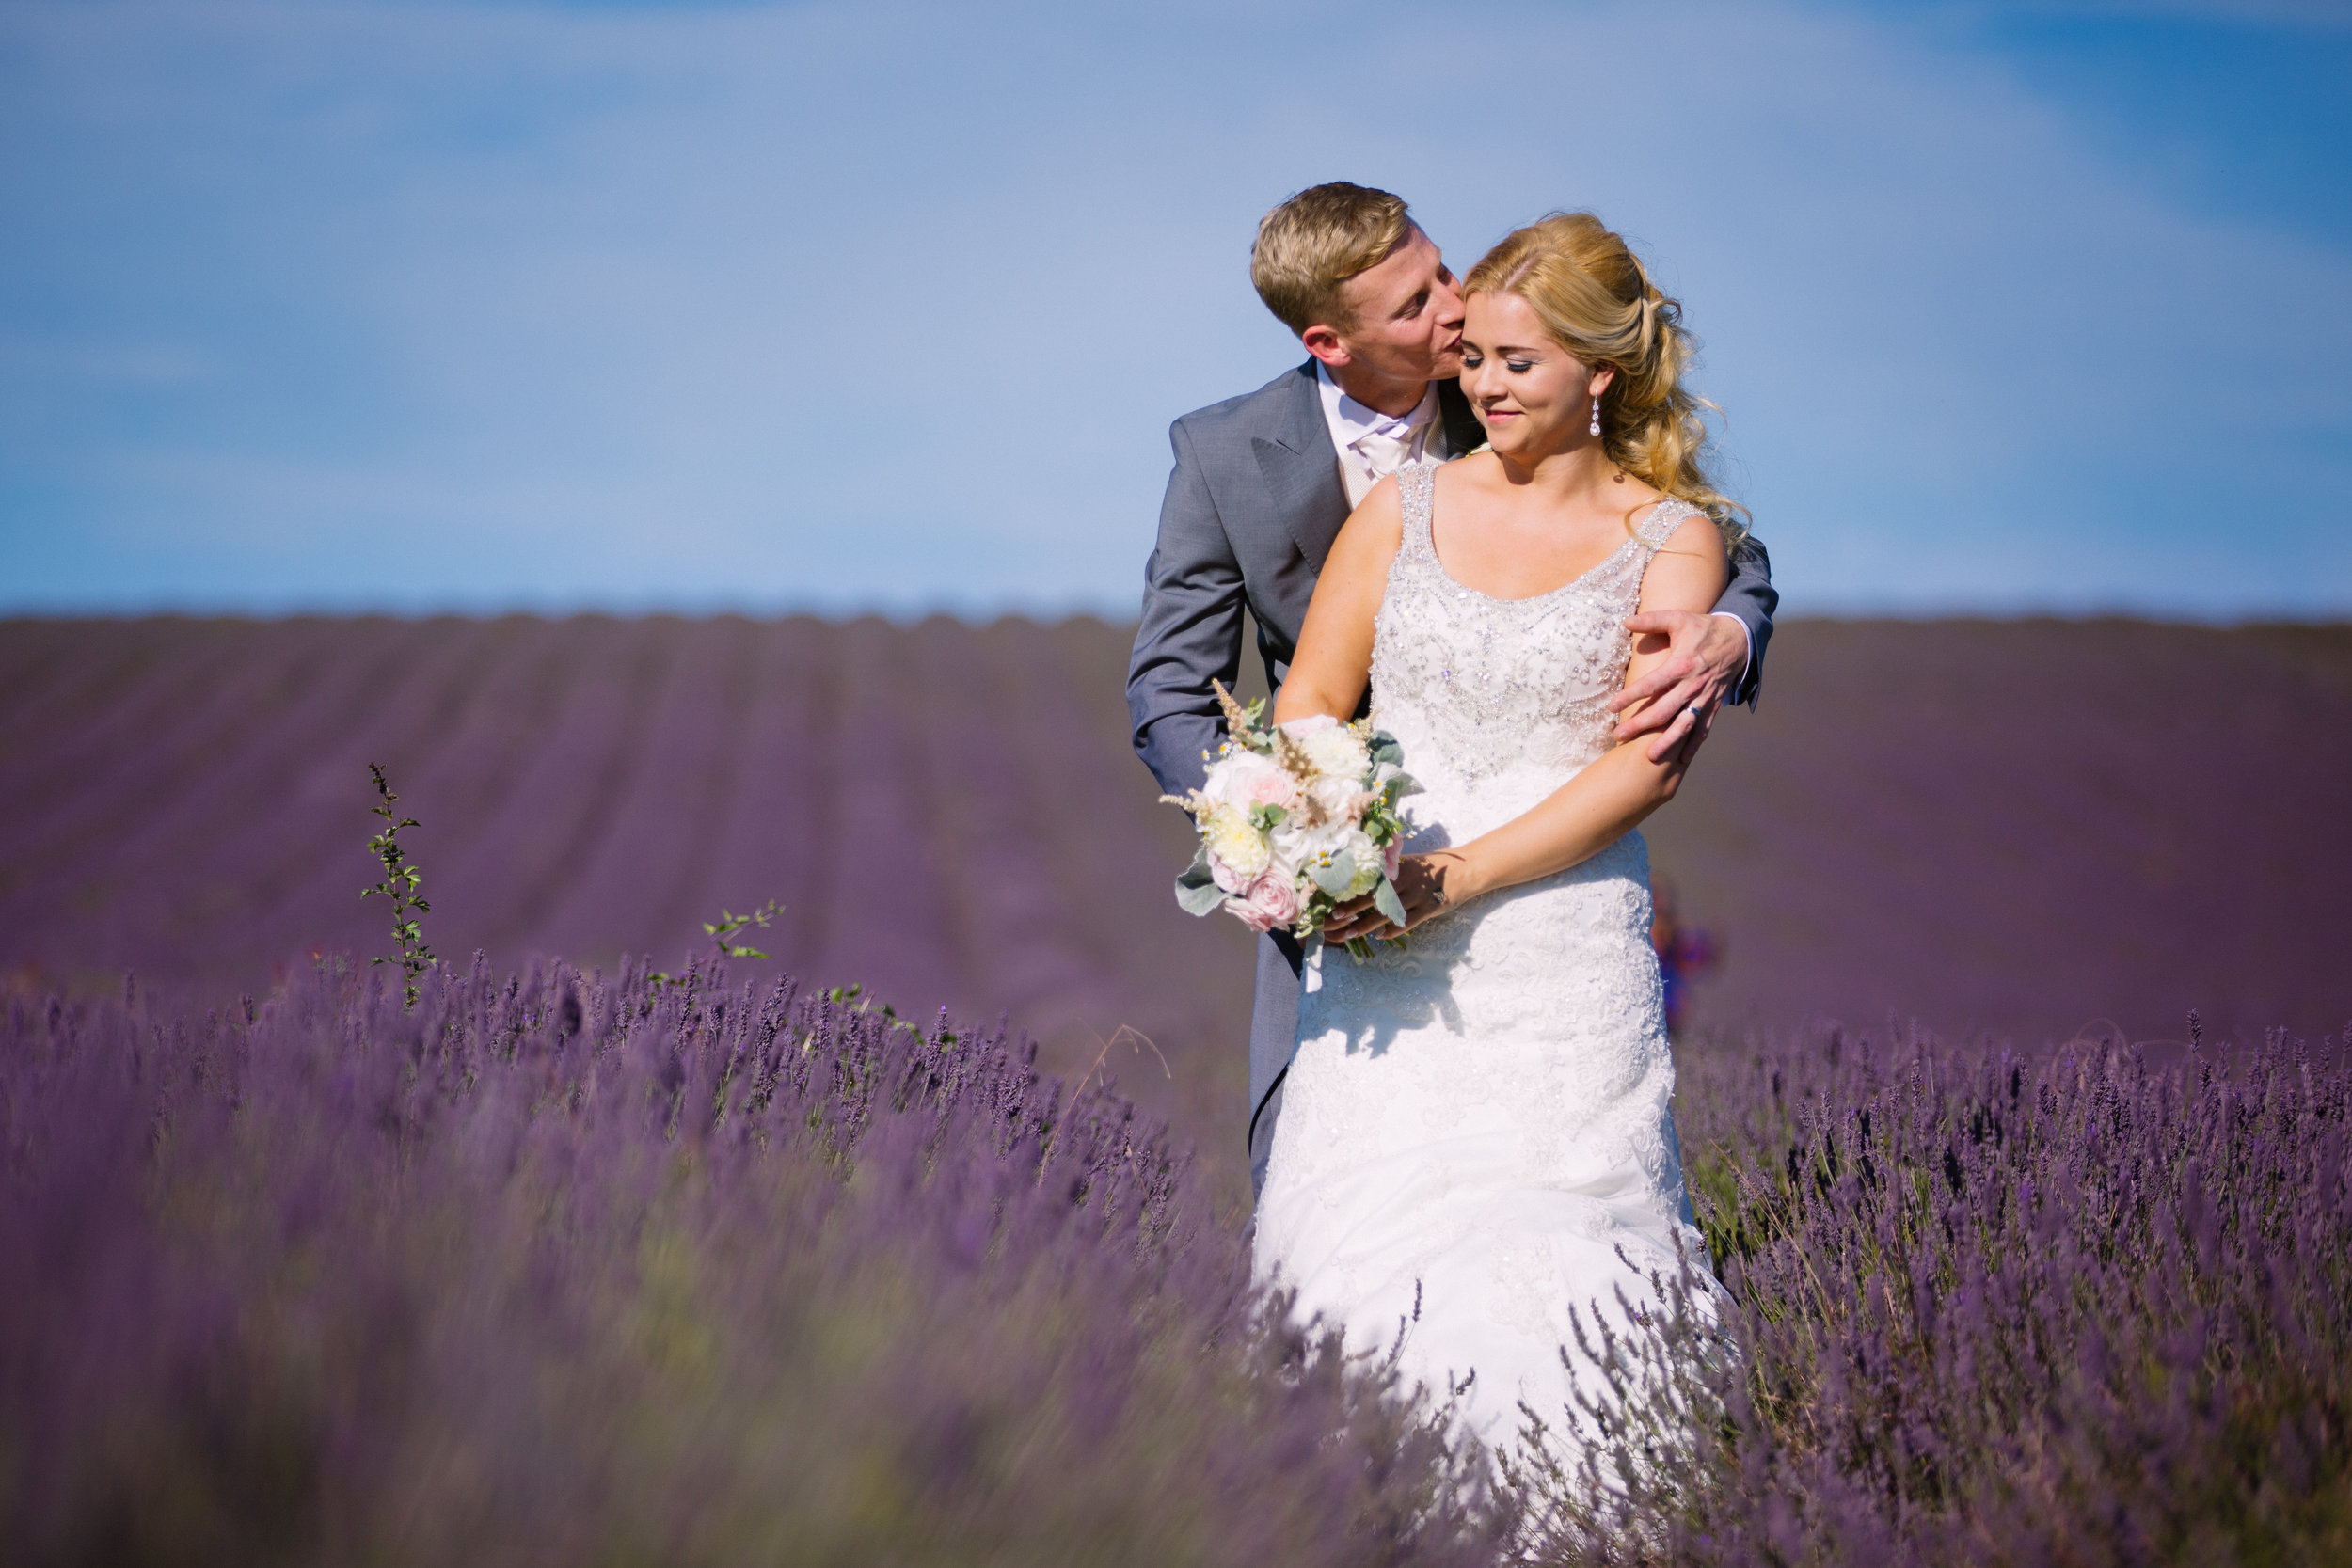 hitchin-hertfordshire-london-wedding-photography-catholic-church-lavender-field-portrait-45